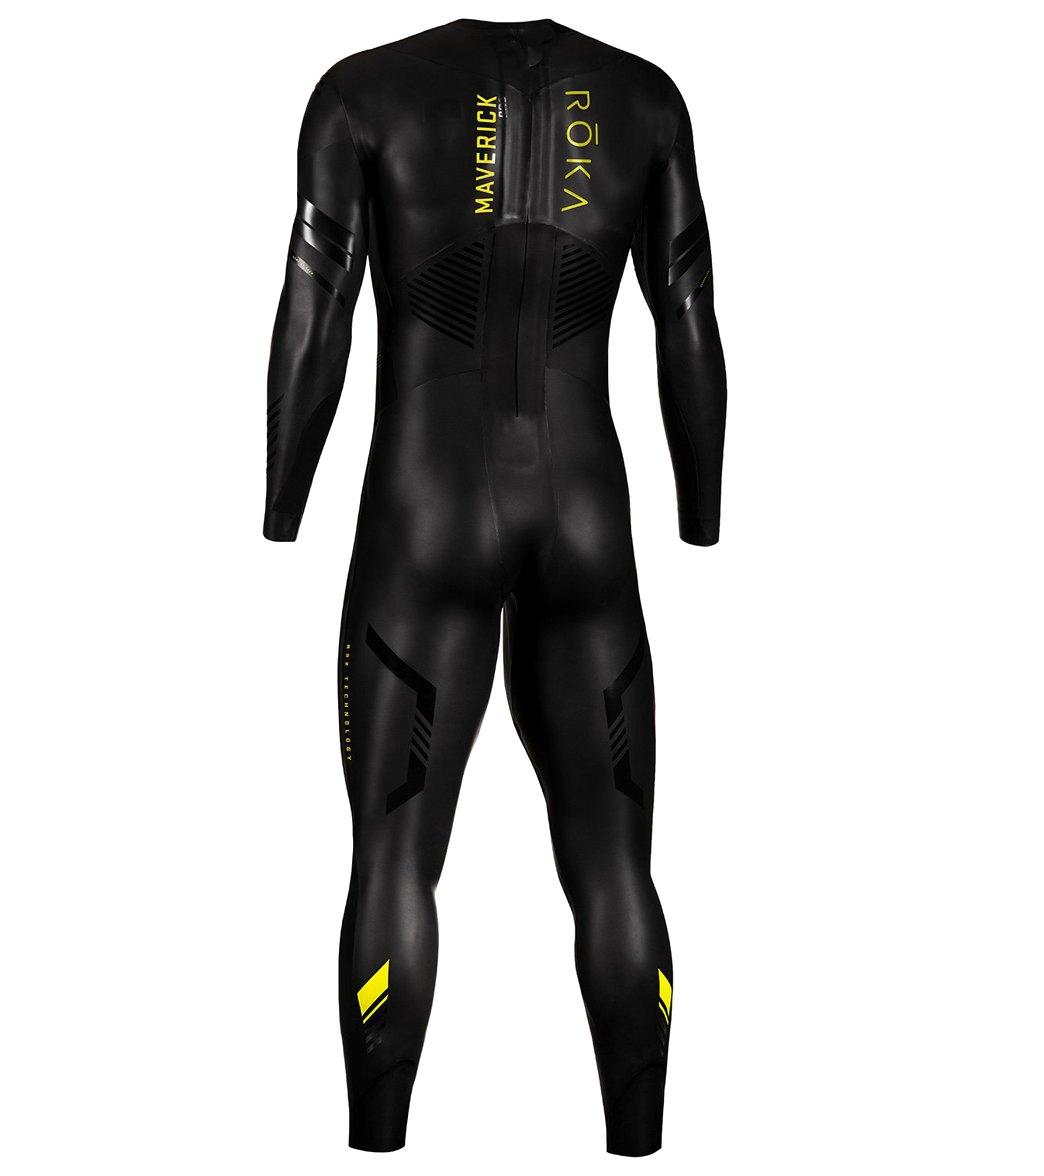 ROKA Men s Maverick Pro II Fullsleeve Tri Wetsuit at SwimOutlet.com ... 16f2c0efa